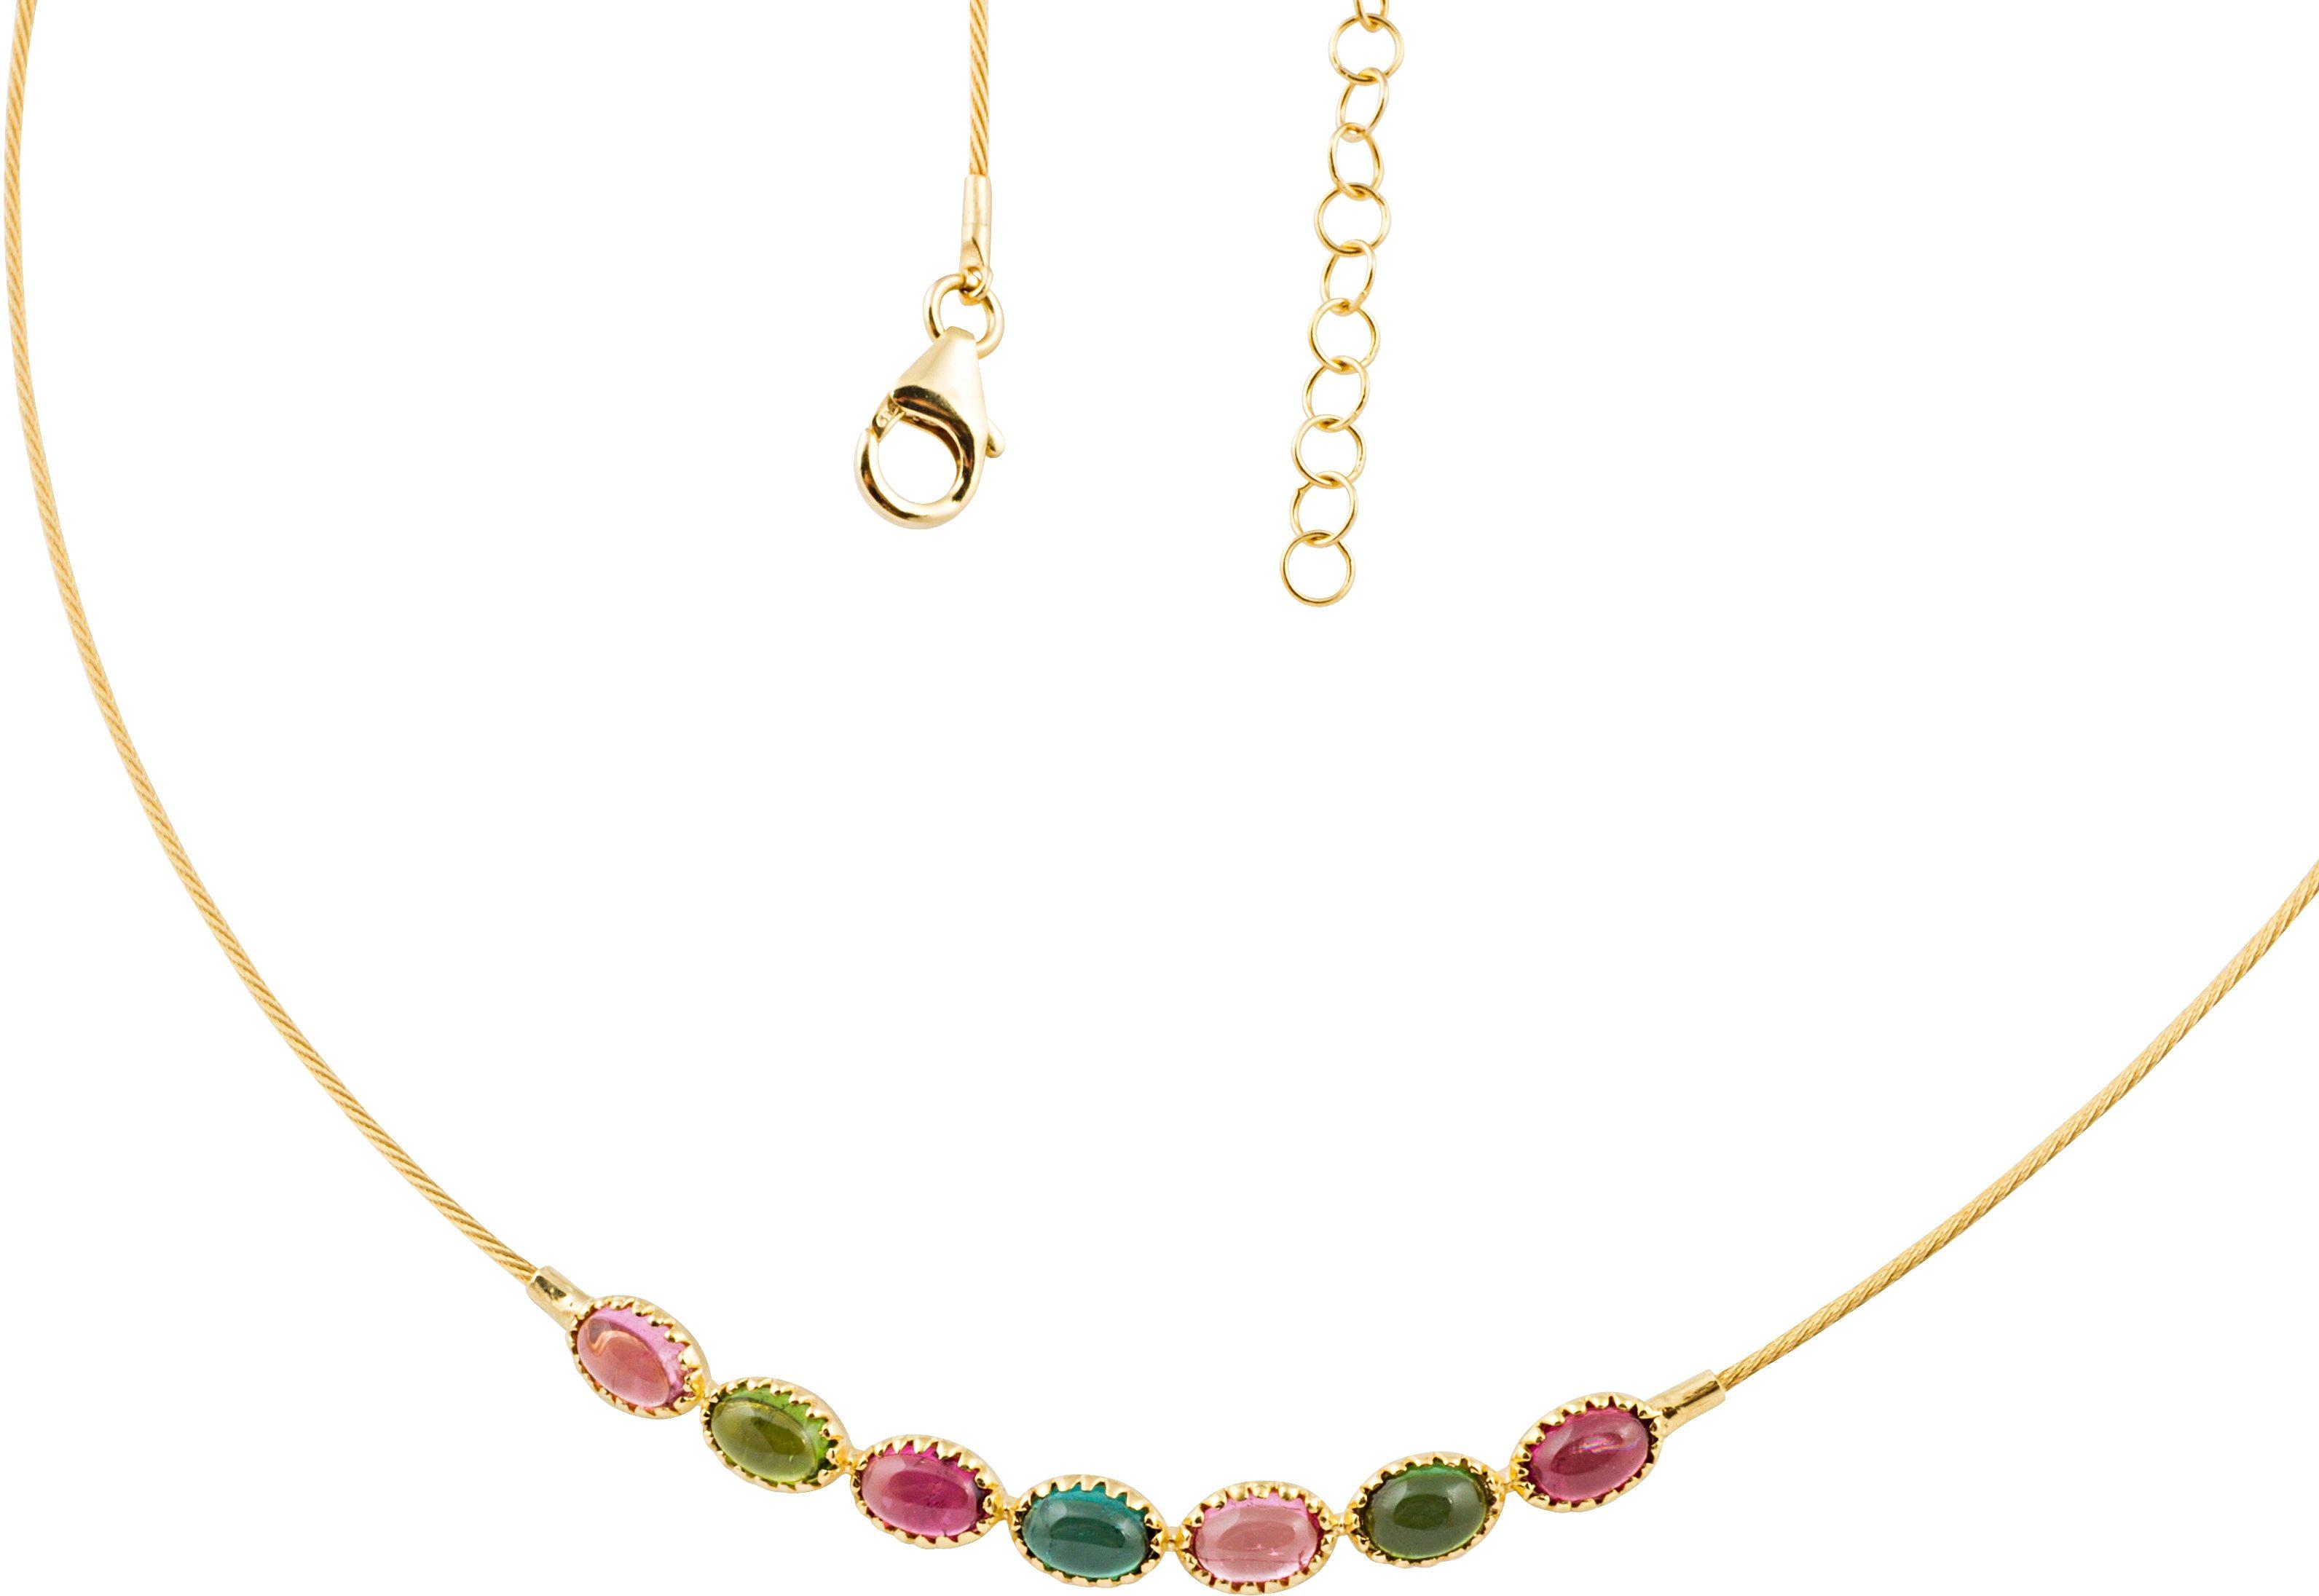 Vivance Jewels Kette mit echten Turmalinen